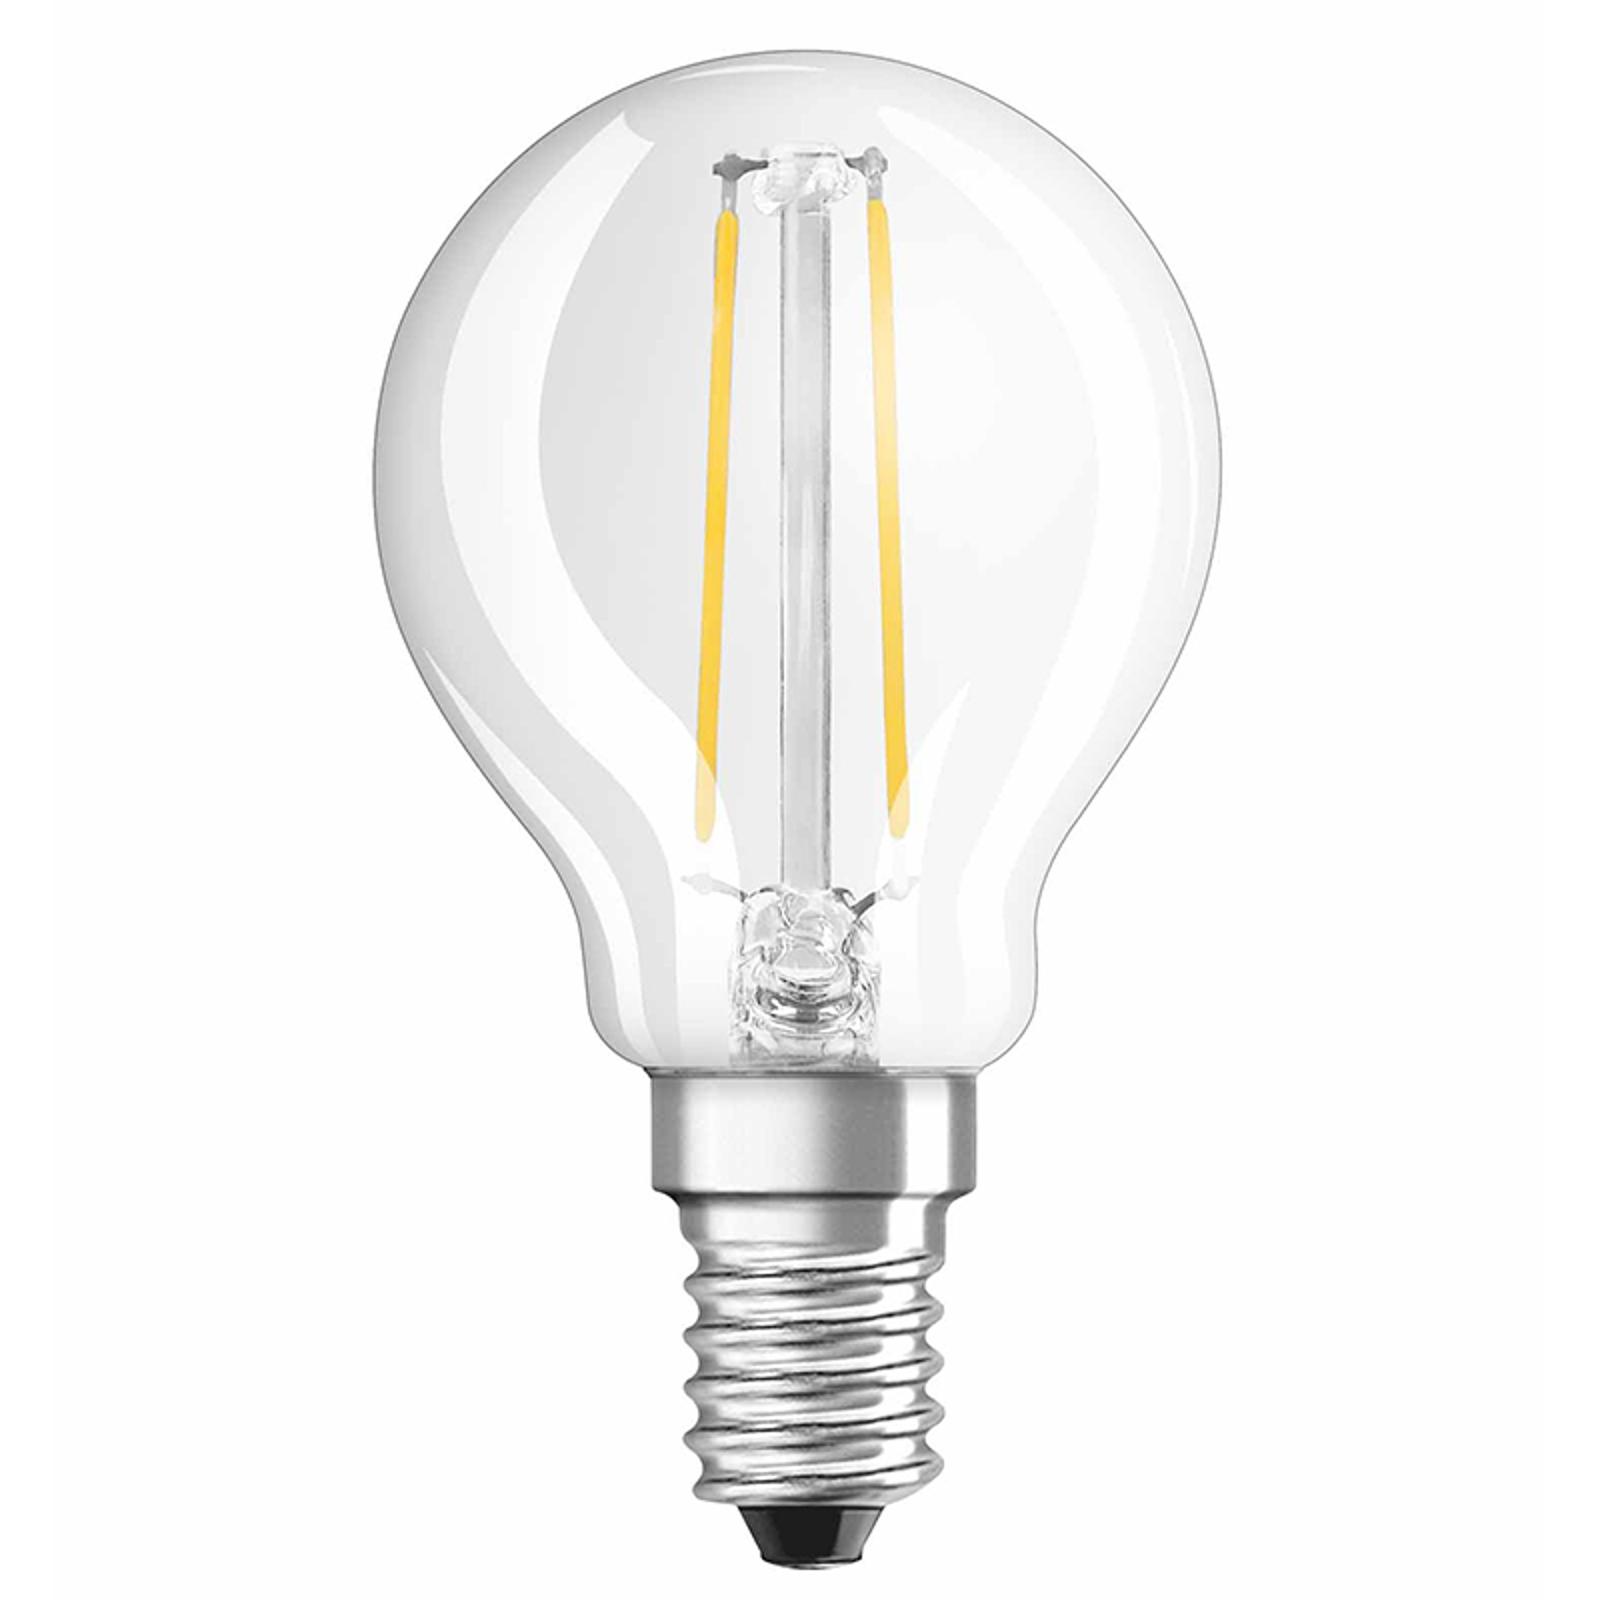 OSRAM-LED-lamppu E14 pisara 2,5W 827 Retrofit